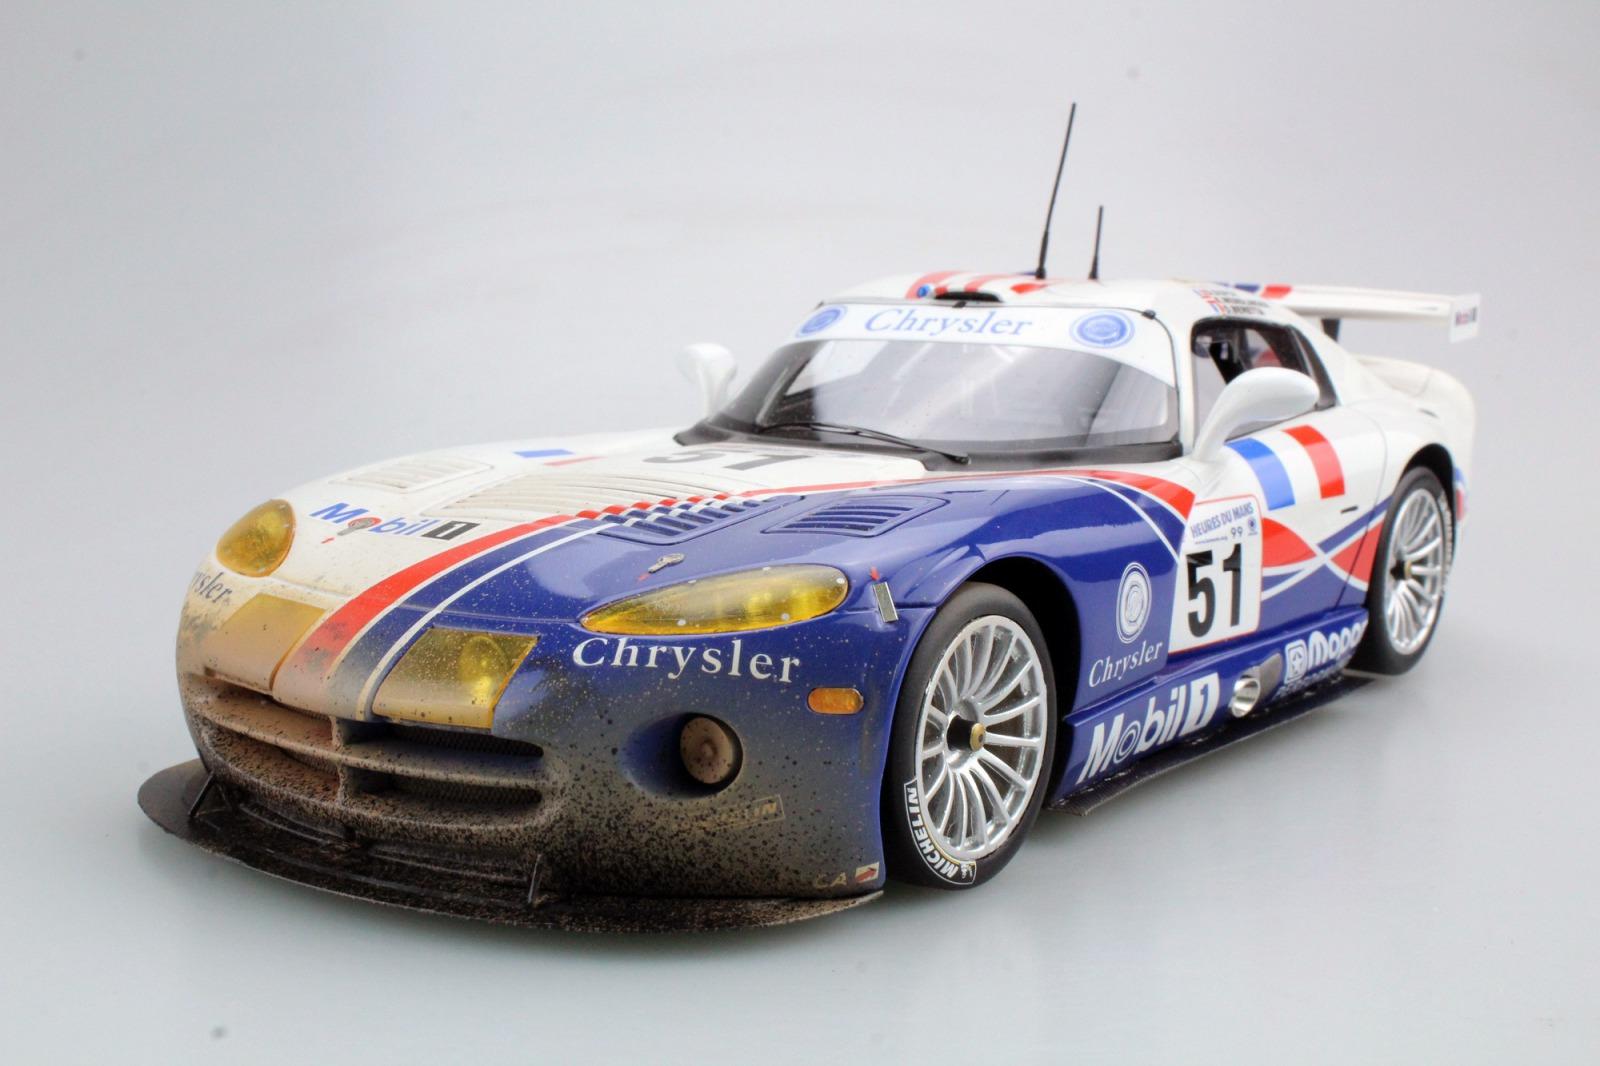 Top Marques 1/18 ミニカー 1999年ルマン24時間 ダッジ ヴァイパー GTS-R V10 No.51 ダーティバージョンDODGE - VIPER GTS-R 8.0L V10 TEAM ORECA N 51 WINNER CLASS 24h LE MANS 1999 D.DUPUY - K.WENDLINGER - O.BERETTA DIRTY VERSION 1:18 Top Marques